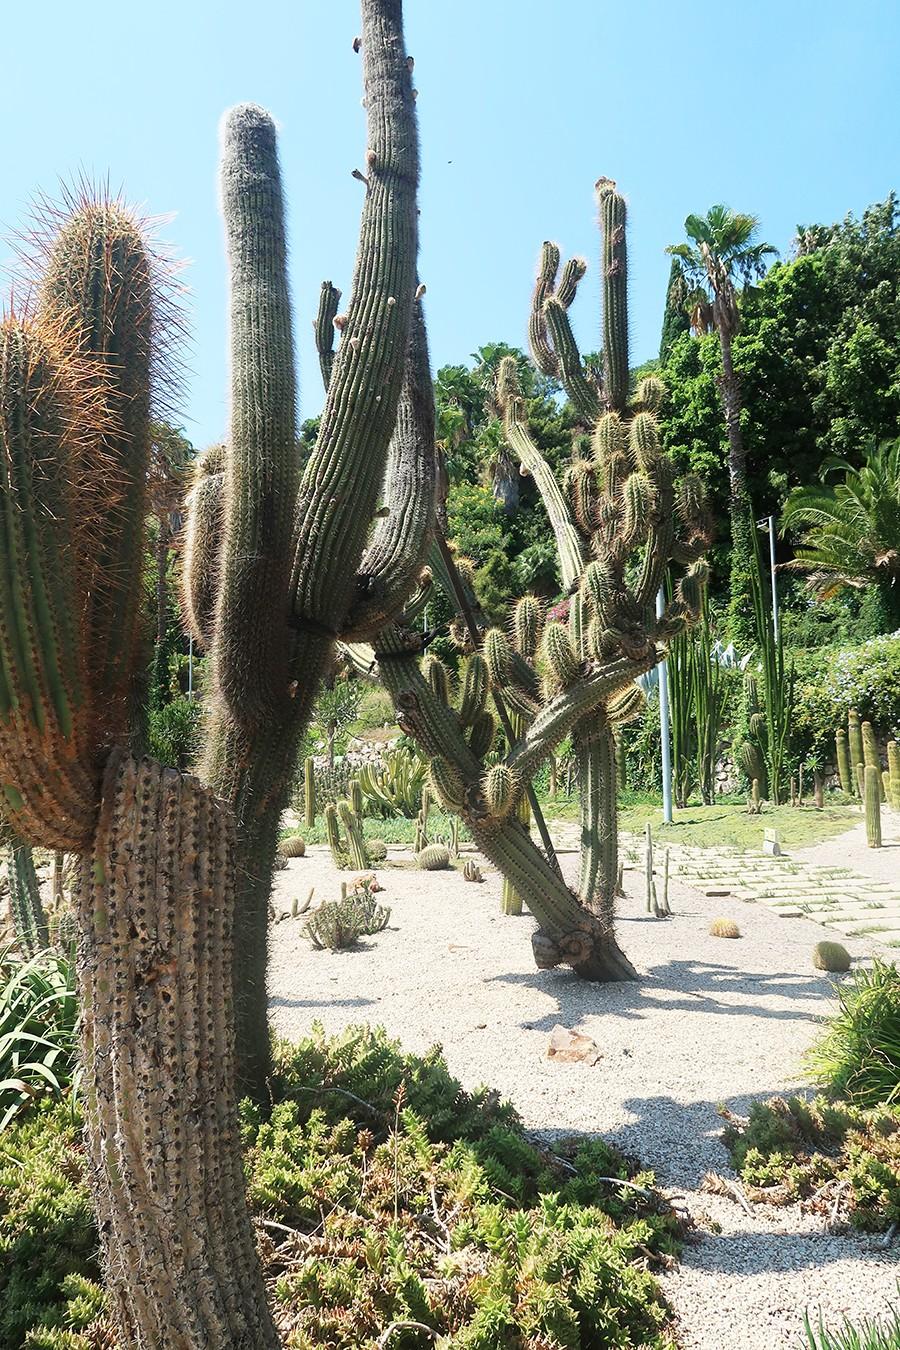 Un parc plein de cactus à Barcelone : Mossen Costs i Llobera Garden